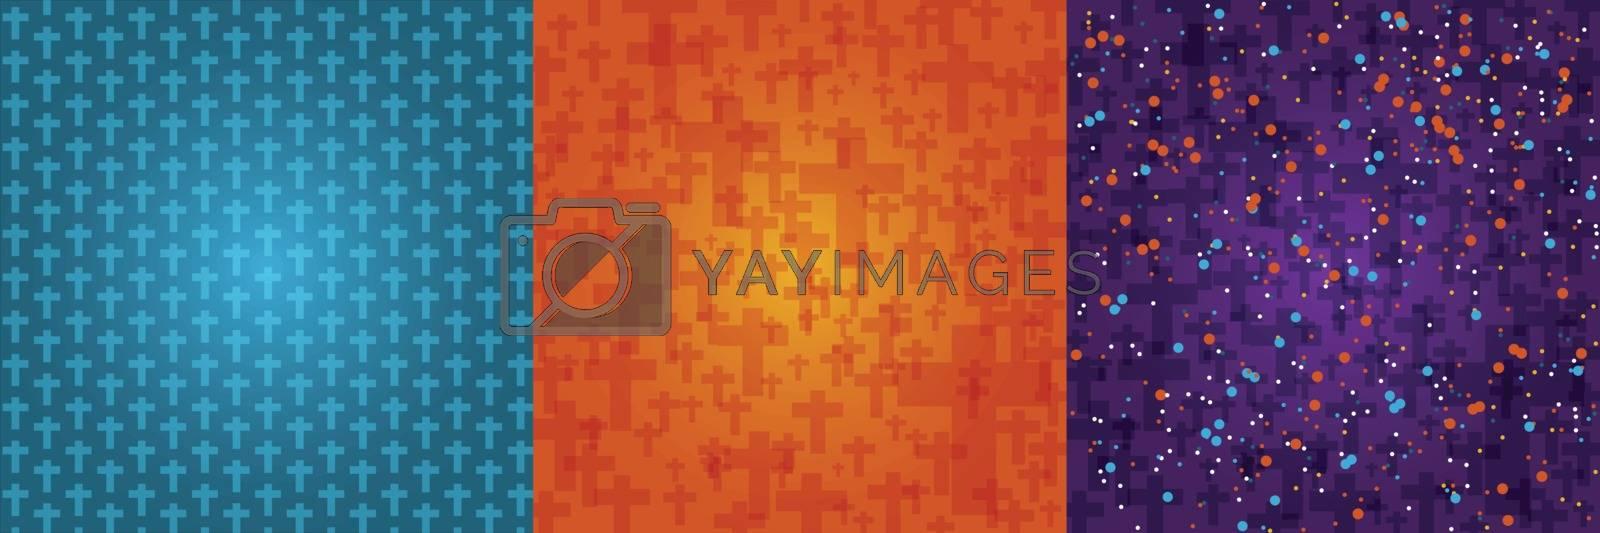 Set background dark orange, blue, purple color halloween with crucifix pattern texture, vector illustration